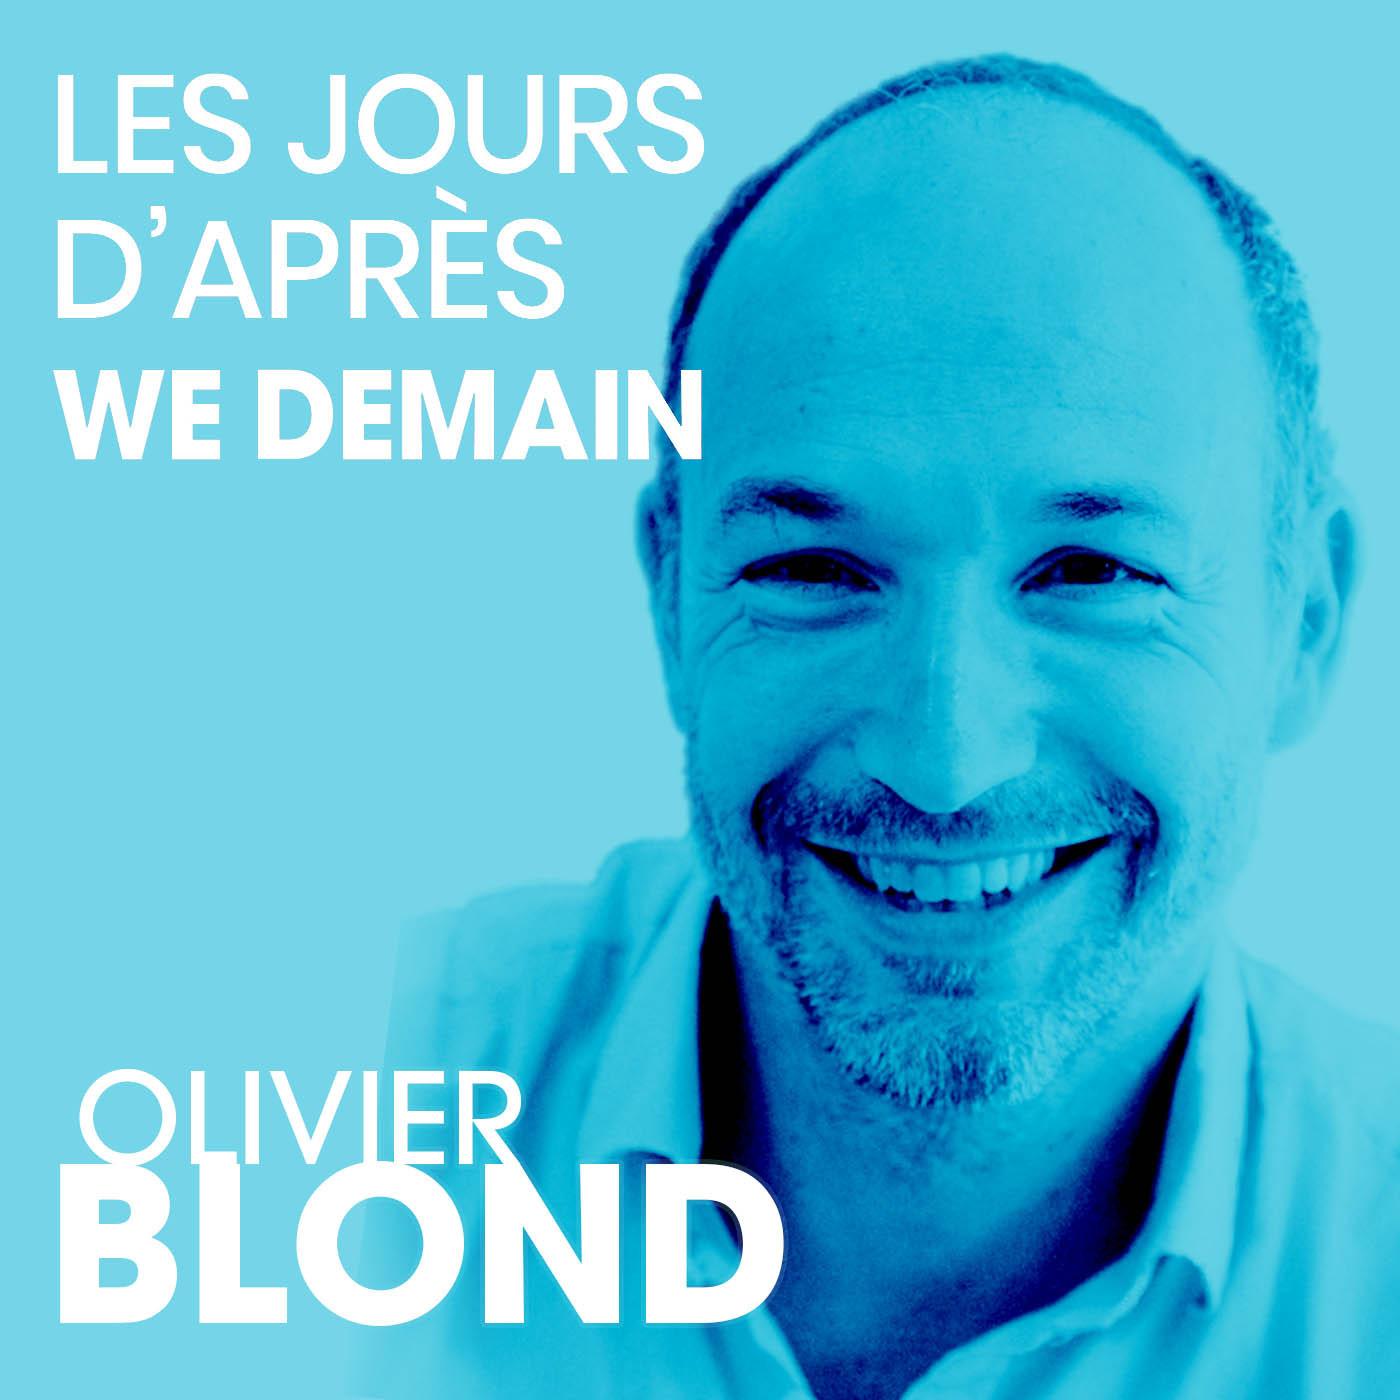 Olivier Blond